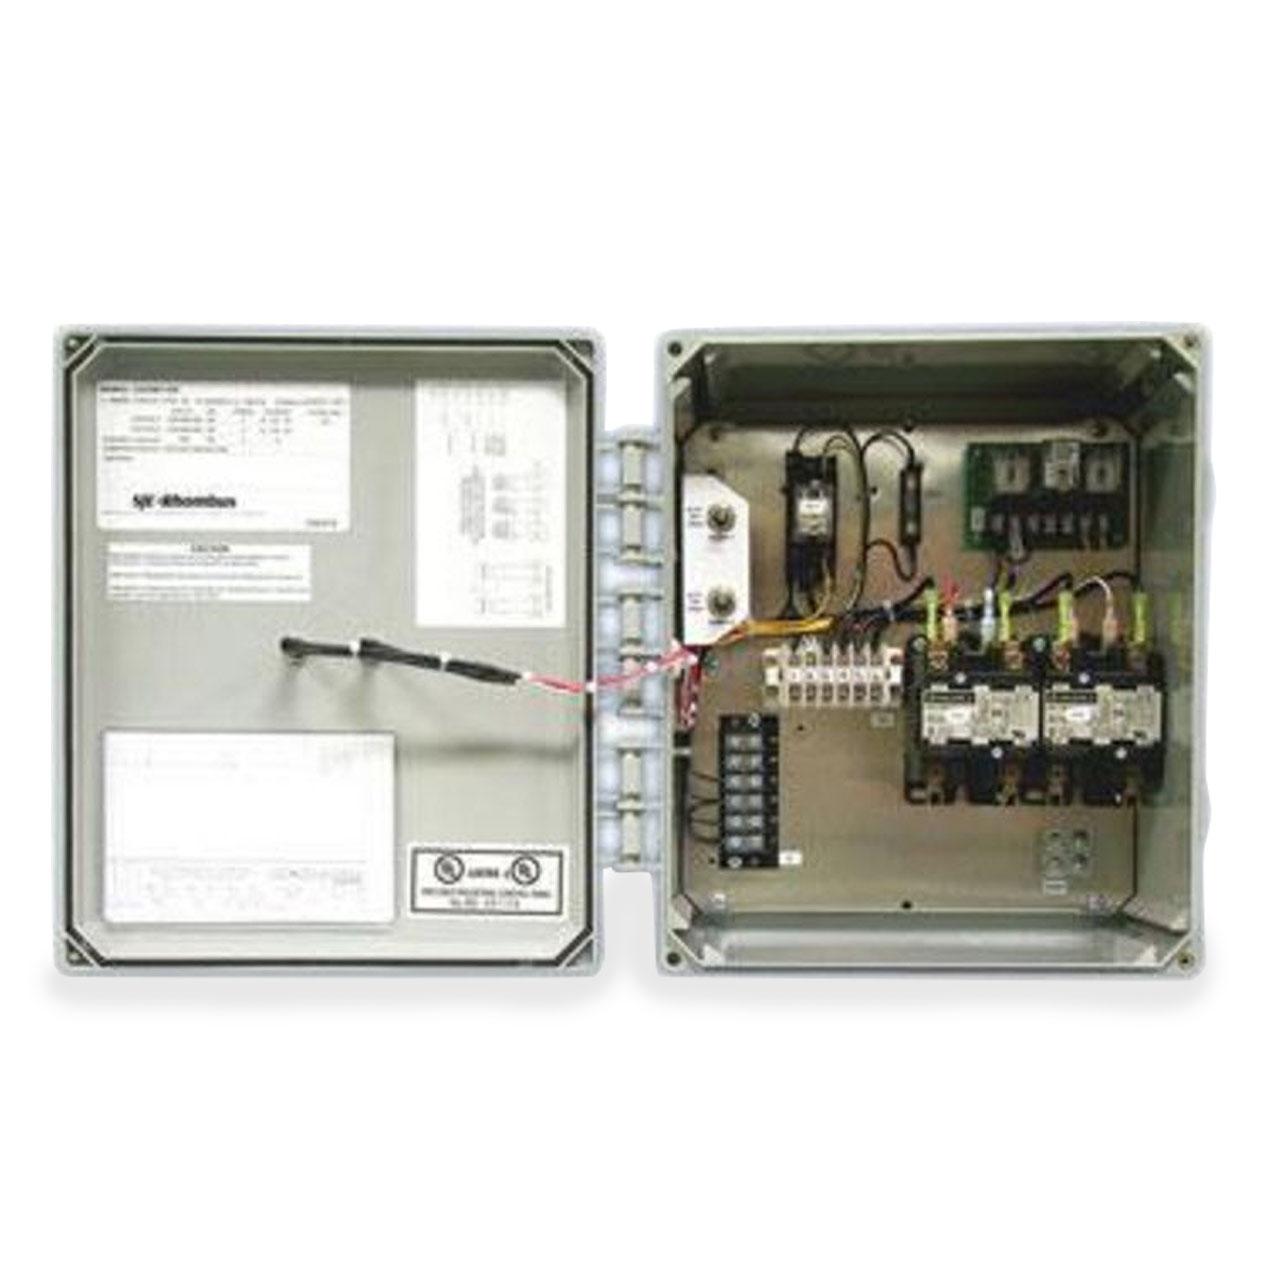 hight resolution of sje rhombus sje rhombus model 126 duplex alternating single phase water well pump control